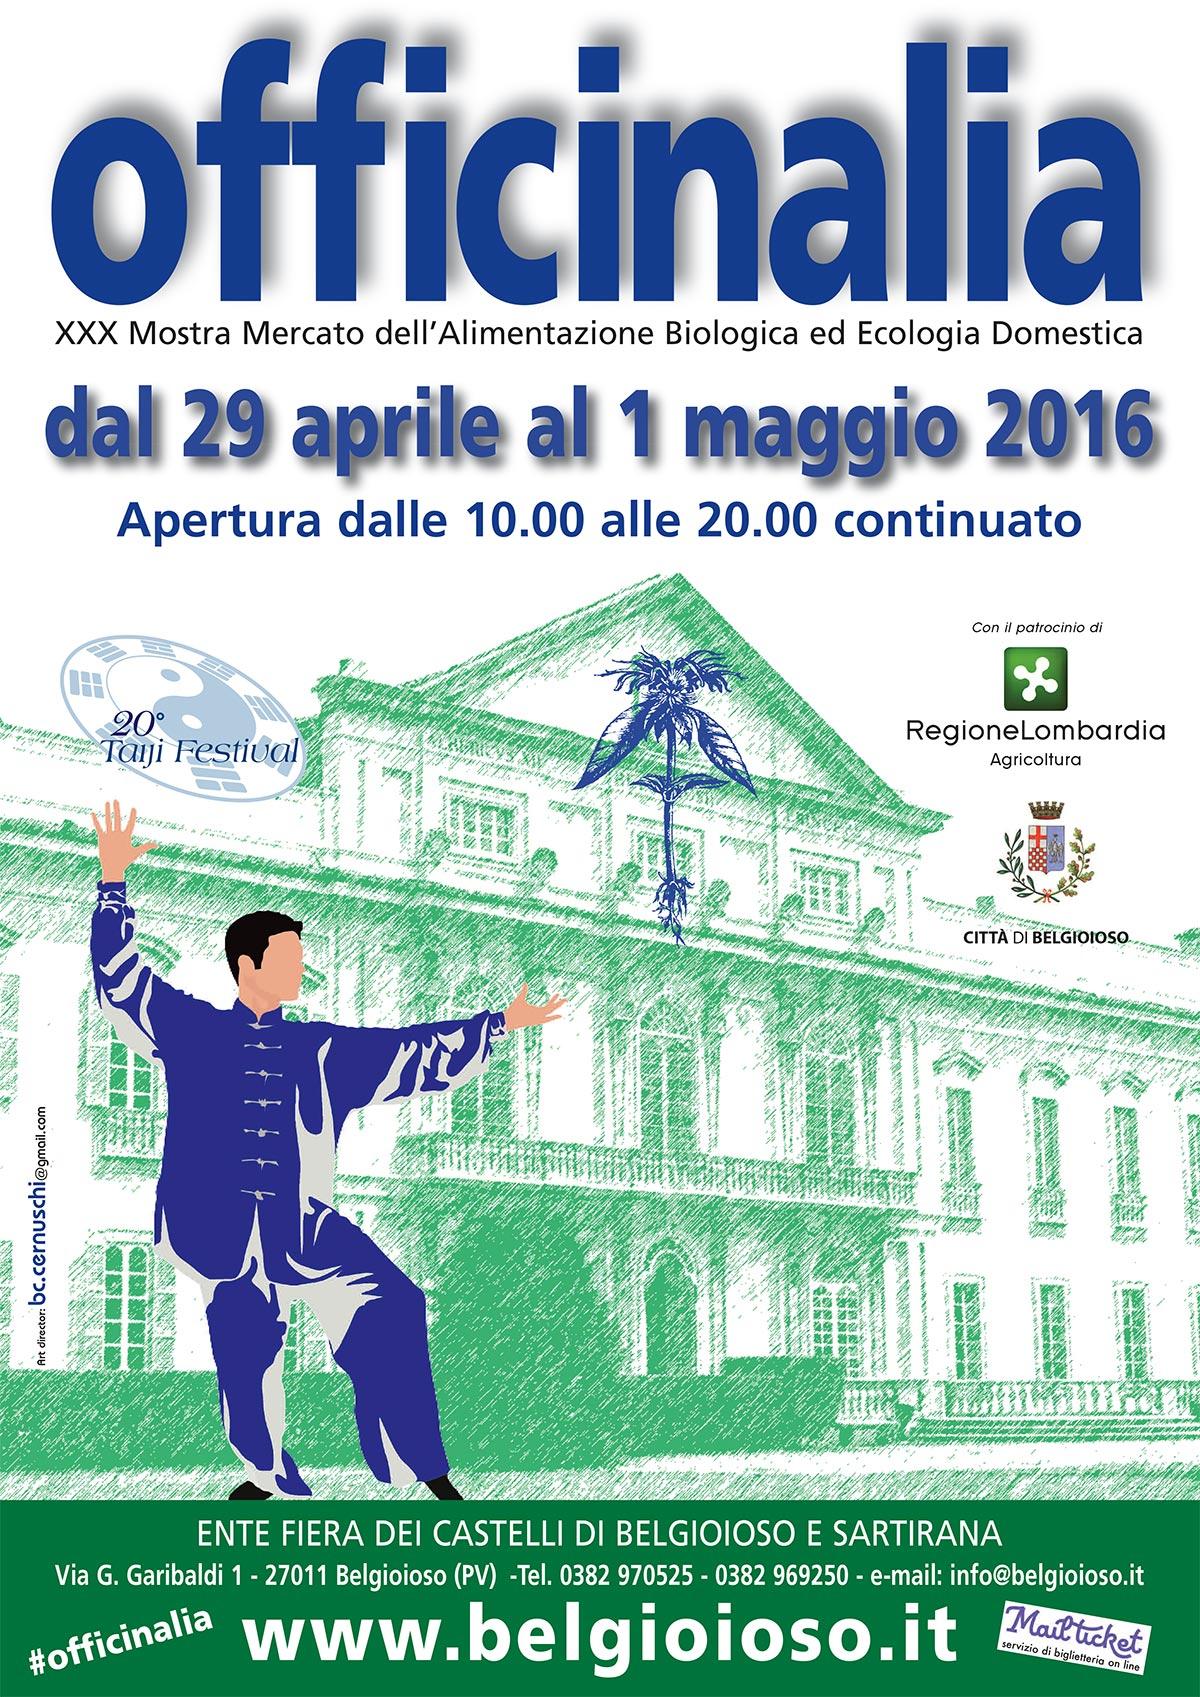 Belgioioso, TaiJi Festival, programma